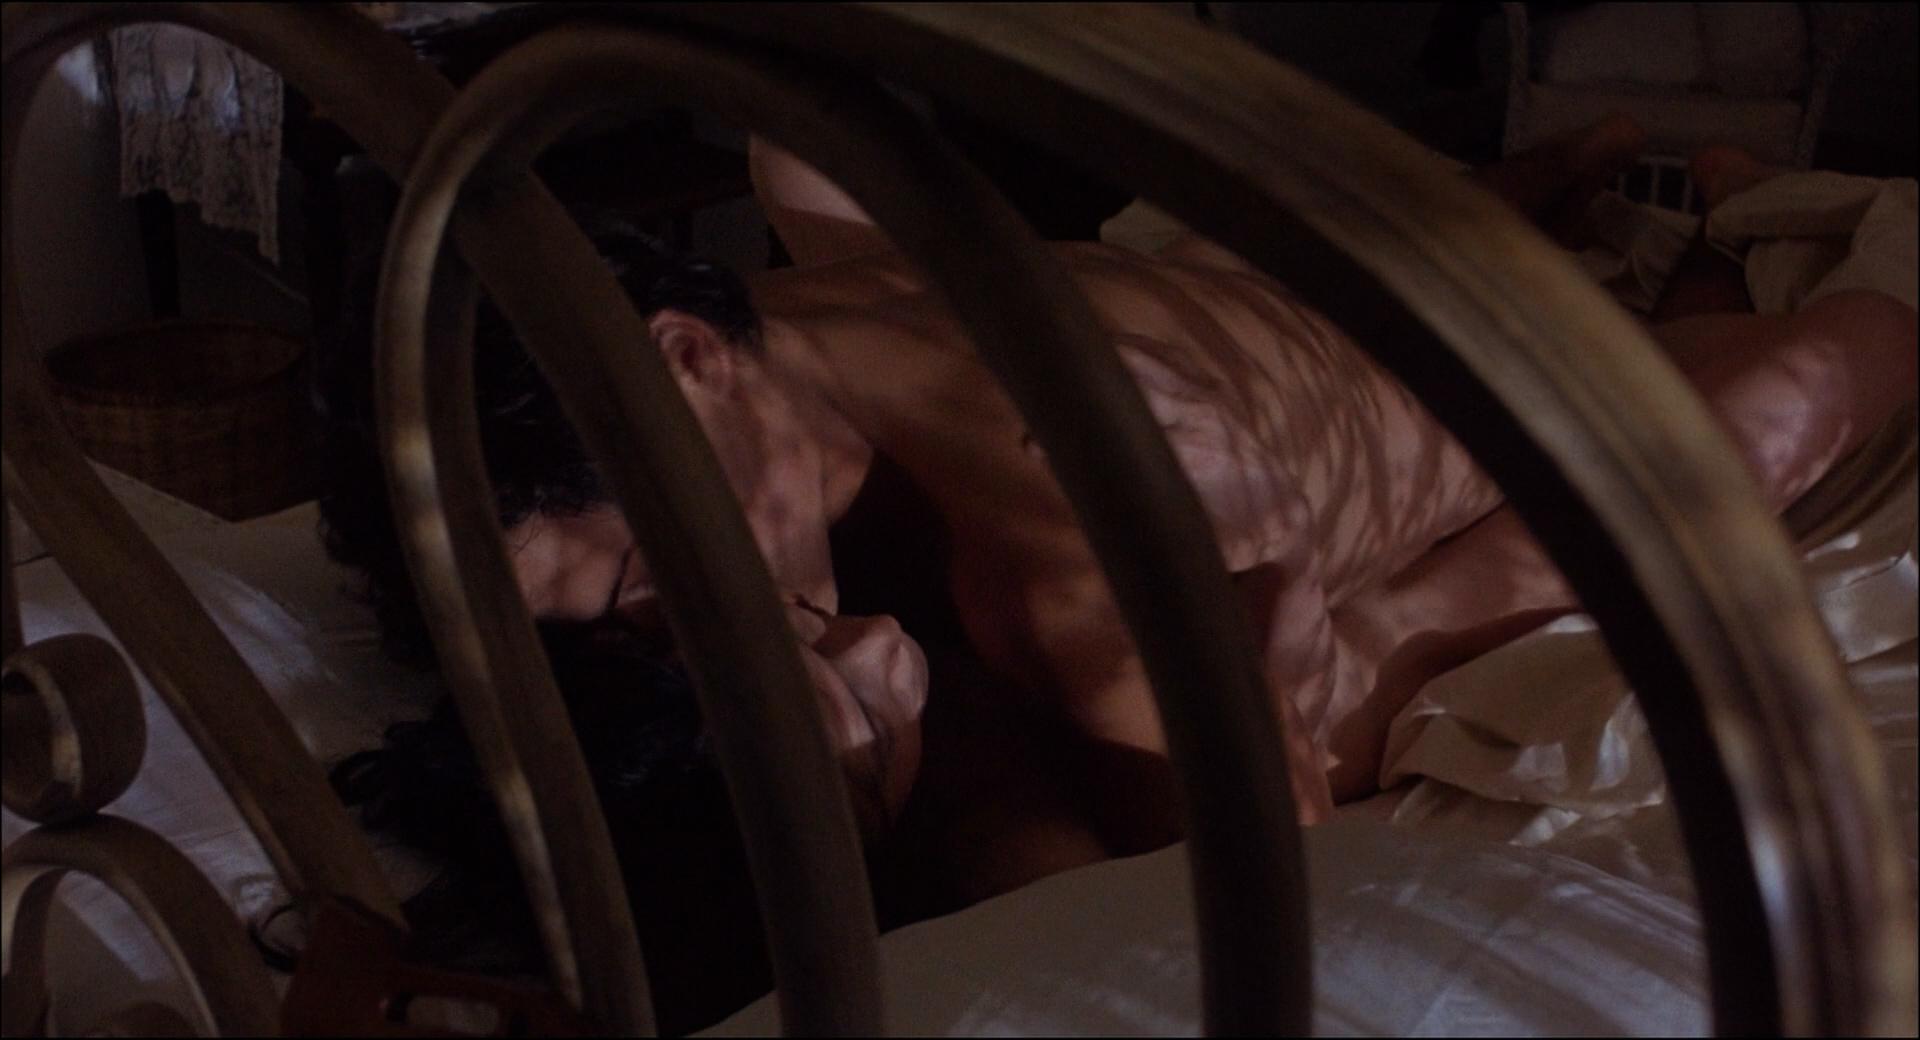 Kim Cattrall nude topless Meg Tilly hot sex Dana Delany hot bikini - Masquerade (1988) HD 1080p BluRay (6)